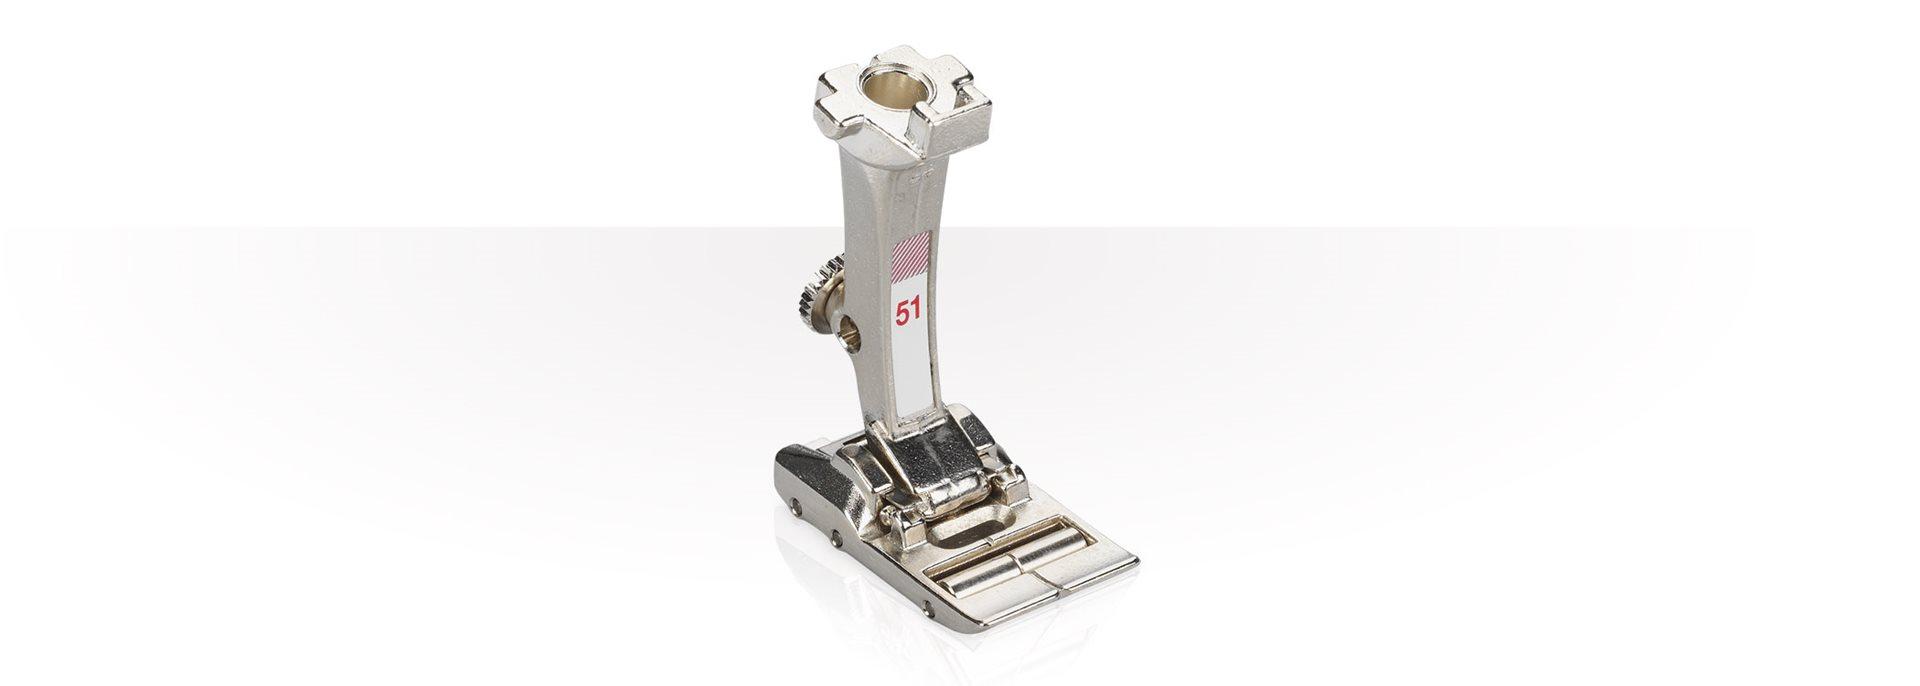 Bernina #51 Roller Foot